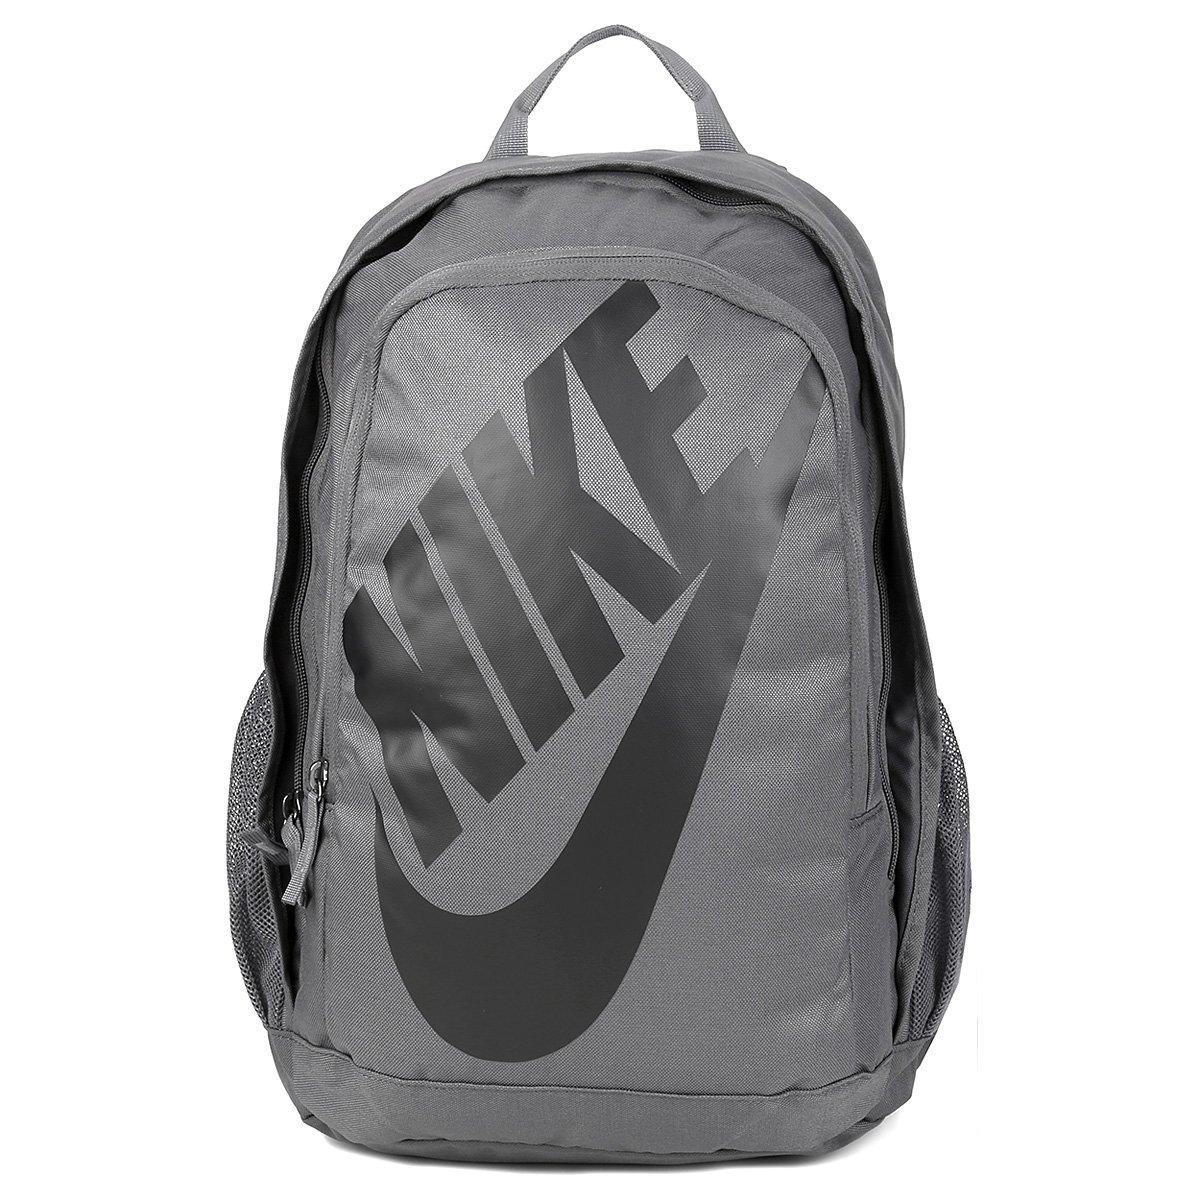 2b56c8ec8 Mochila Nike Hayward Futura 2.0 - Cinza e Preto | Netshoes